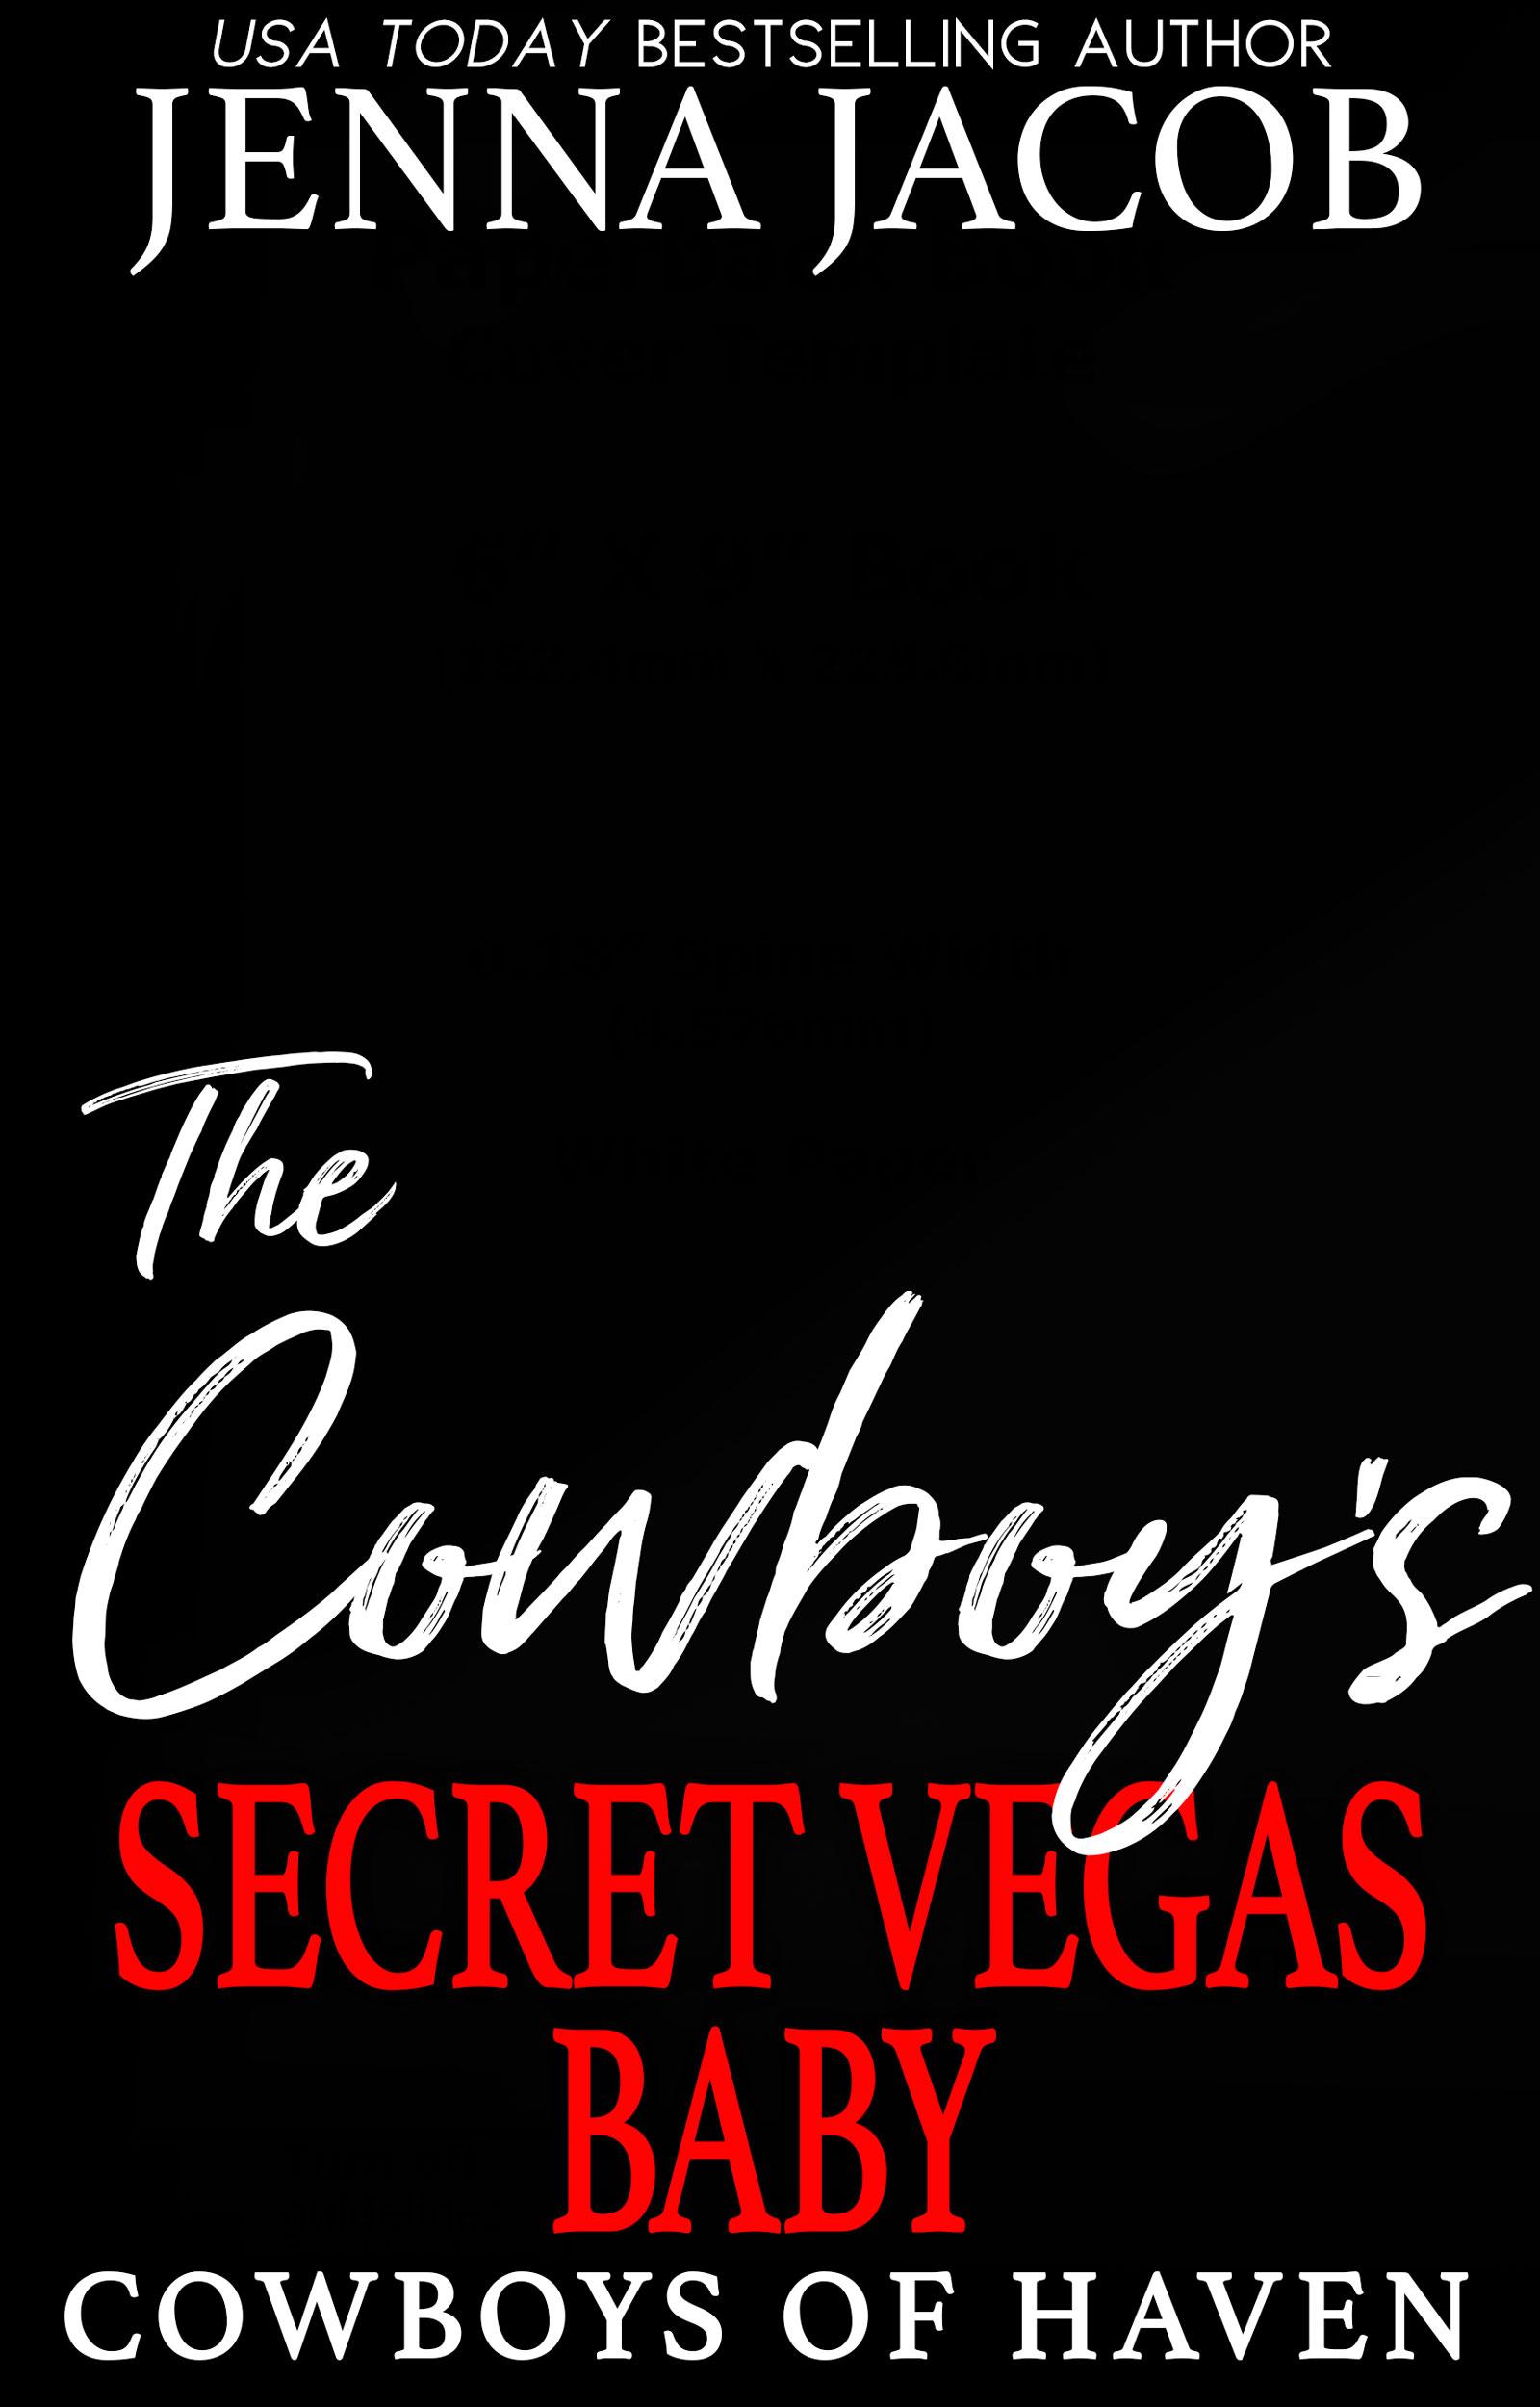 The Cowboy's Secret Vegas Baby